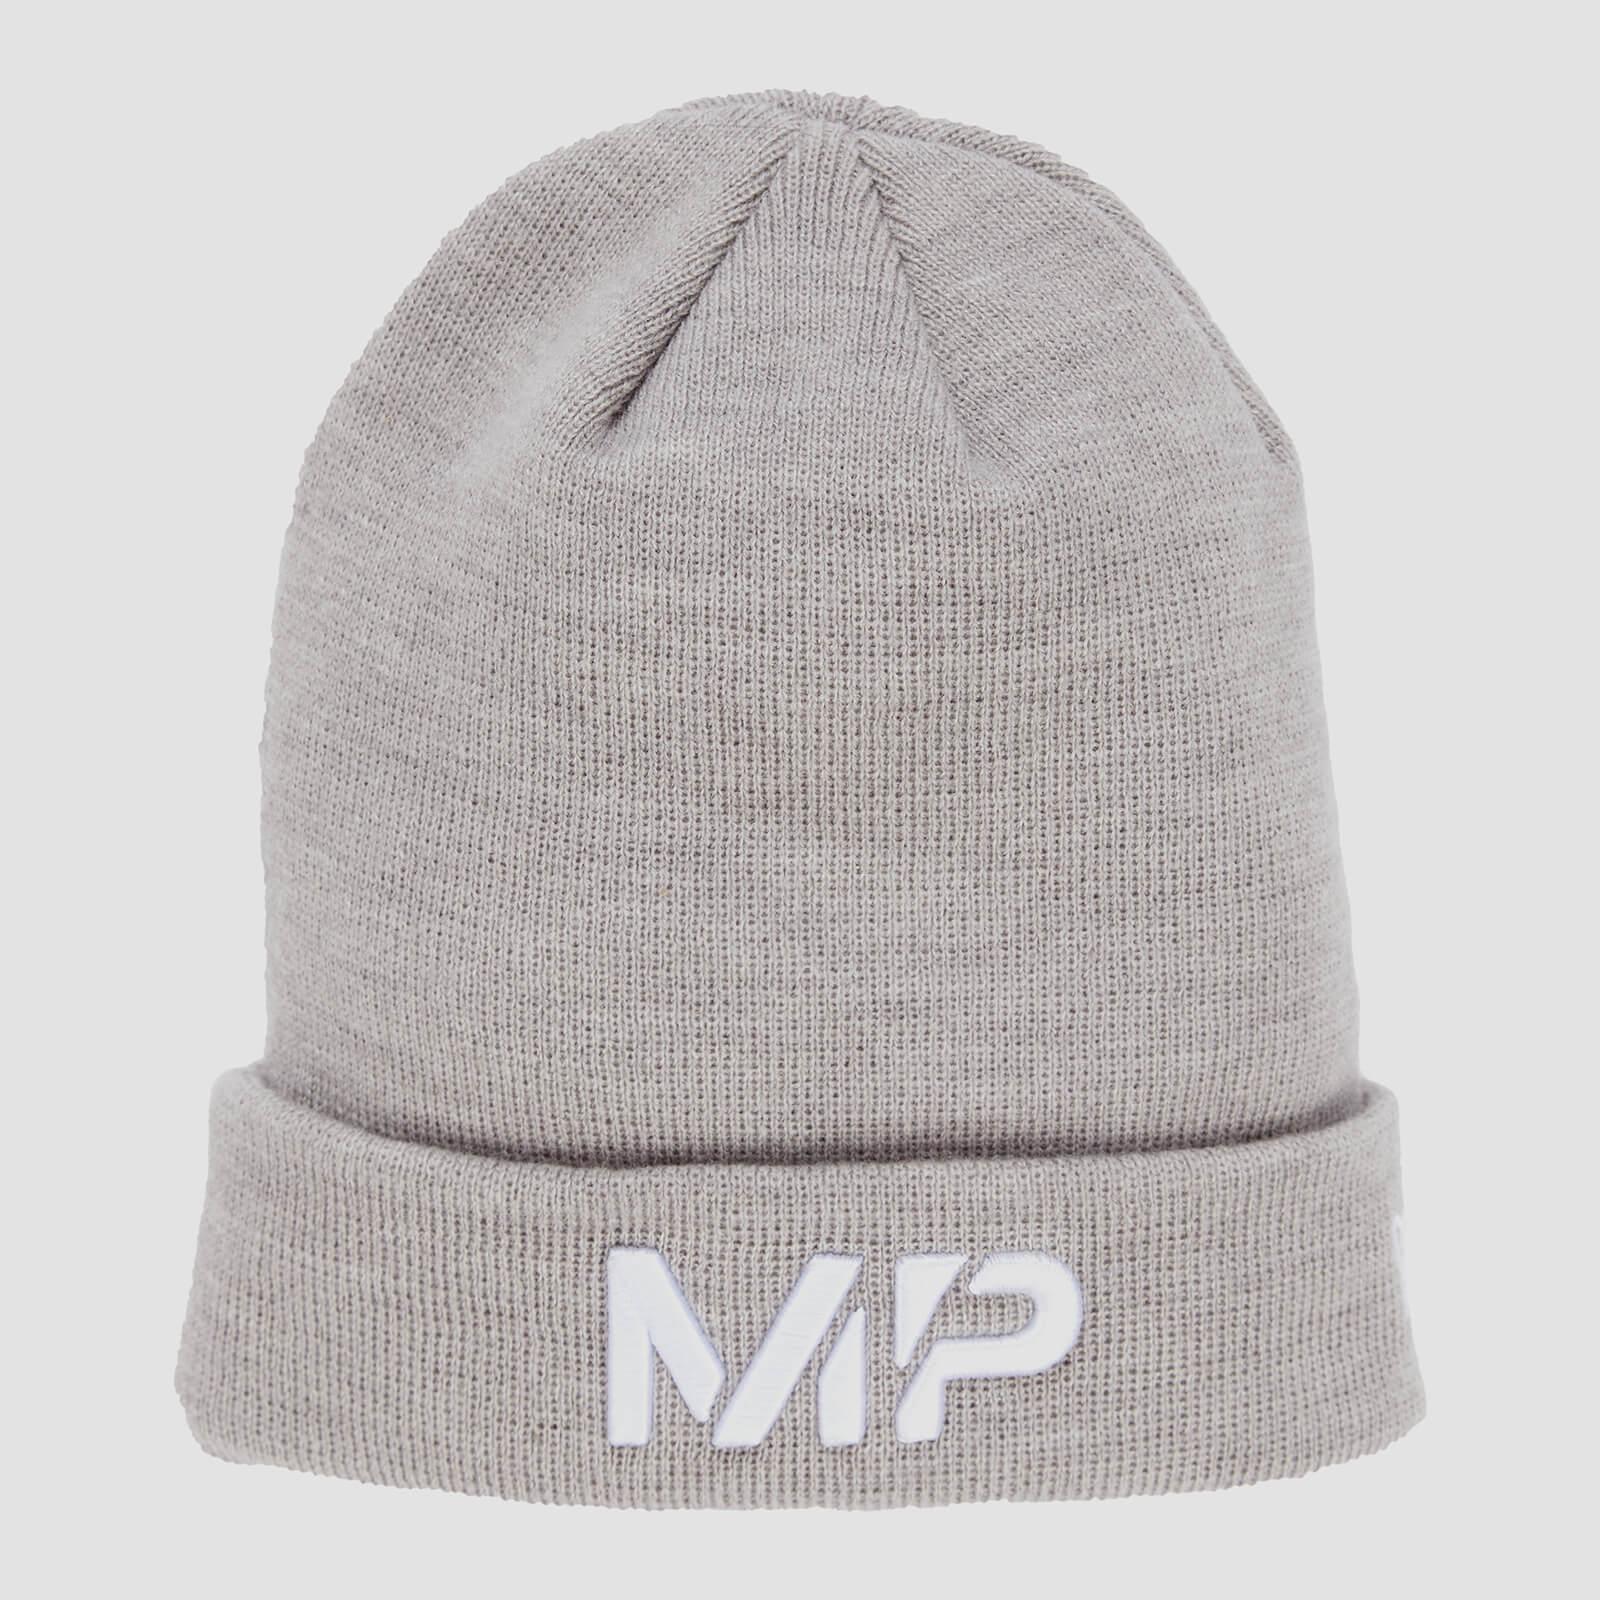 MP New Era Cuff Knitted Beanie - Chrome/White